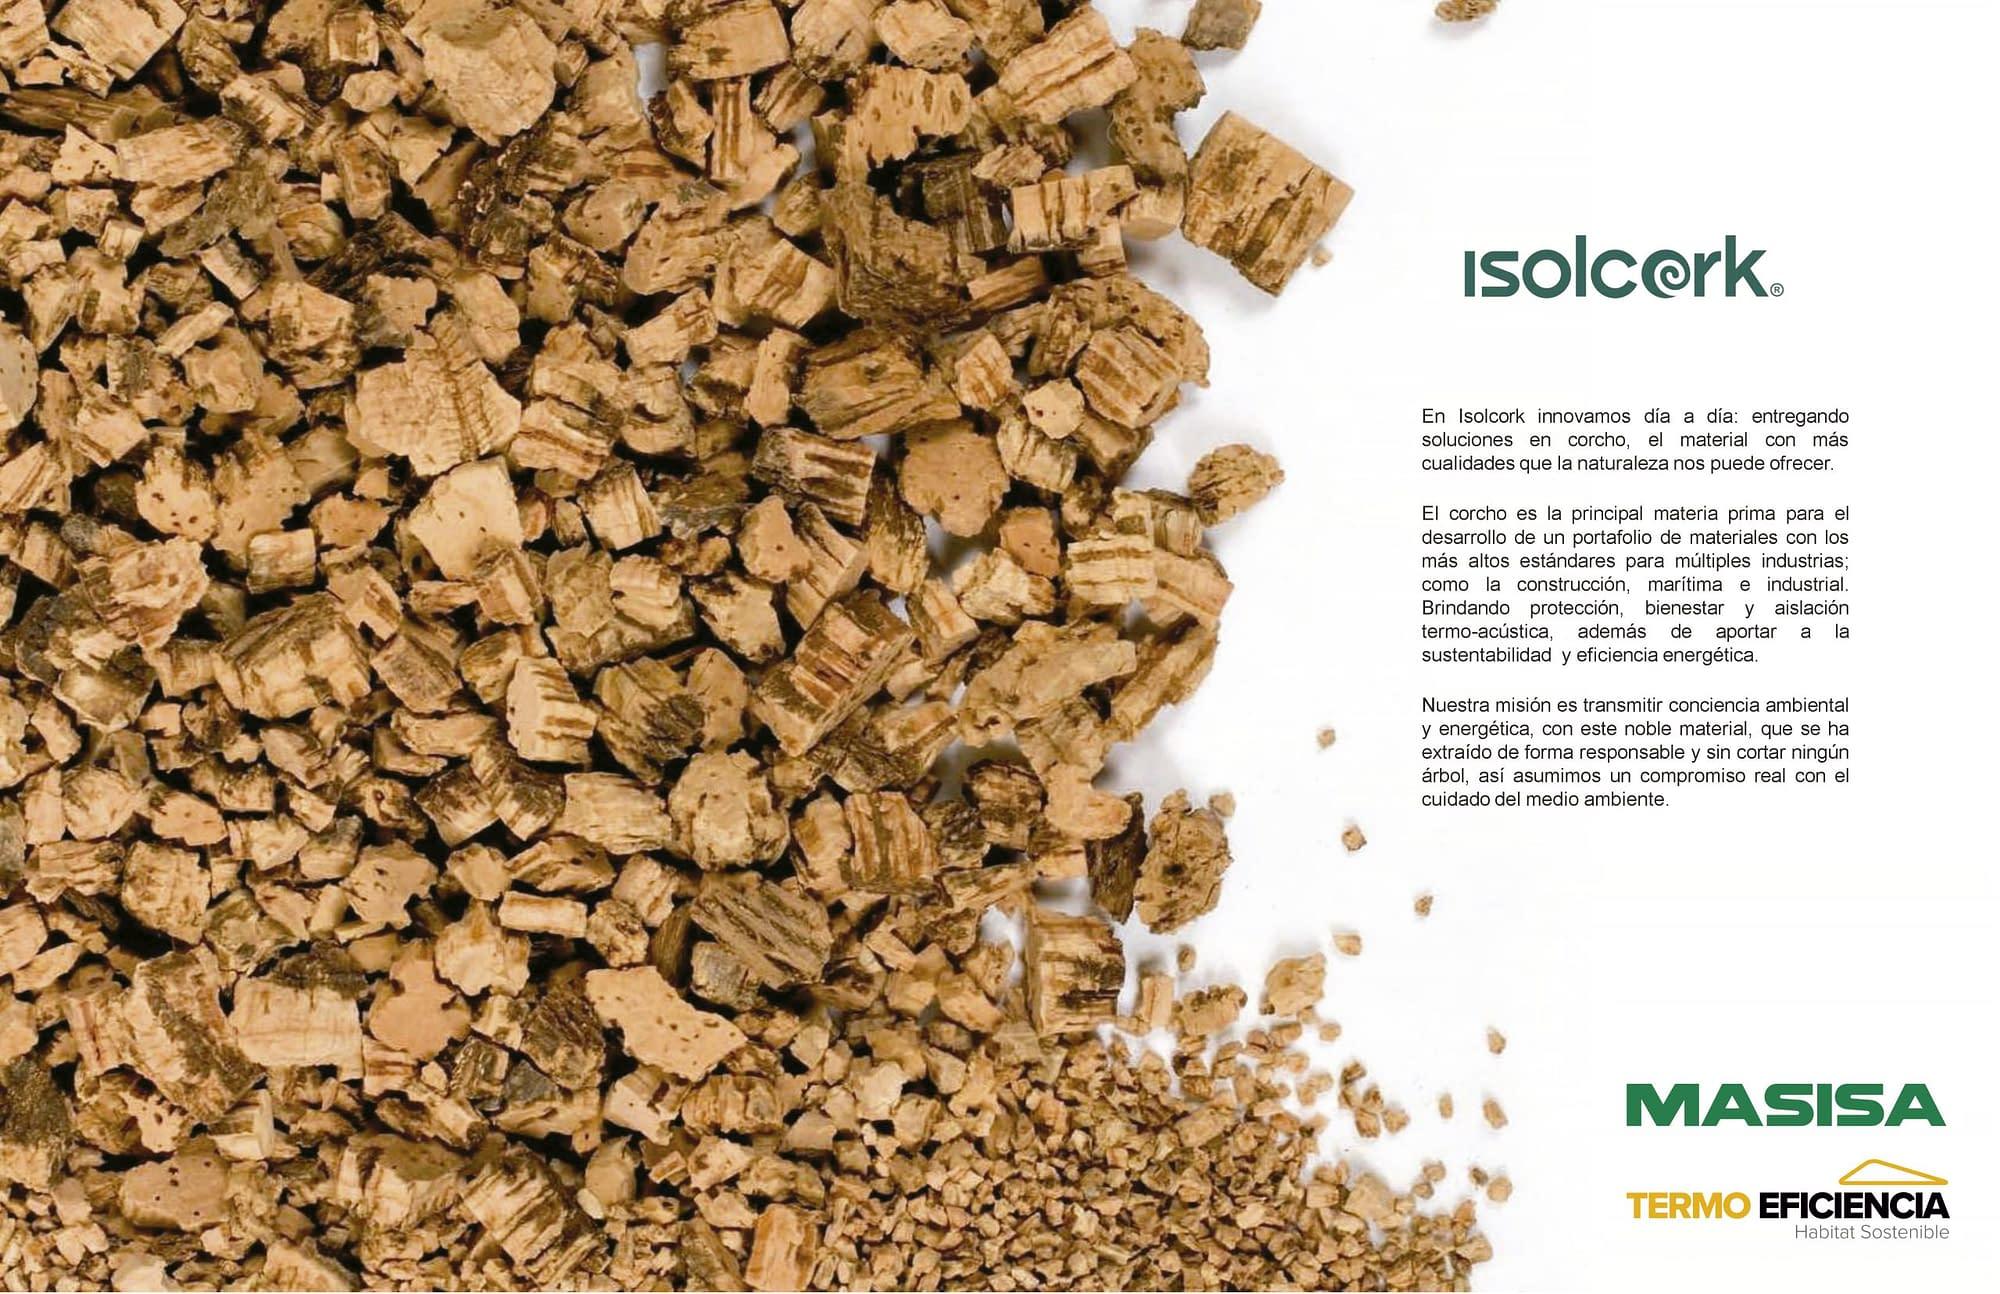 Corcho Proyectado colombia isolcork masisa